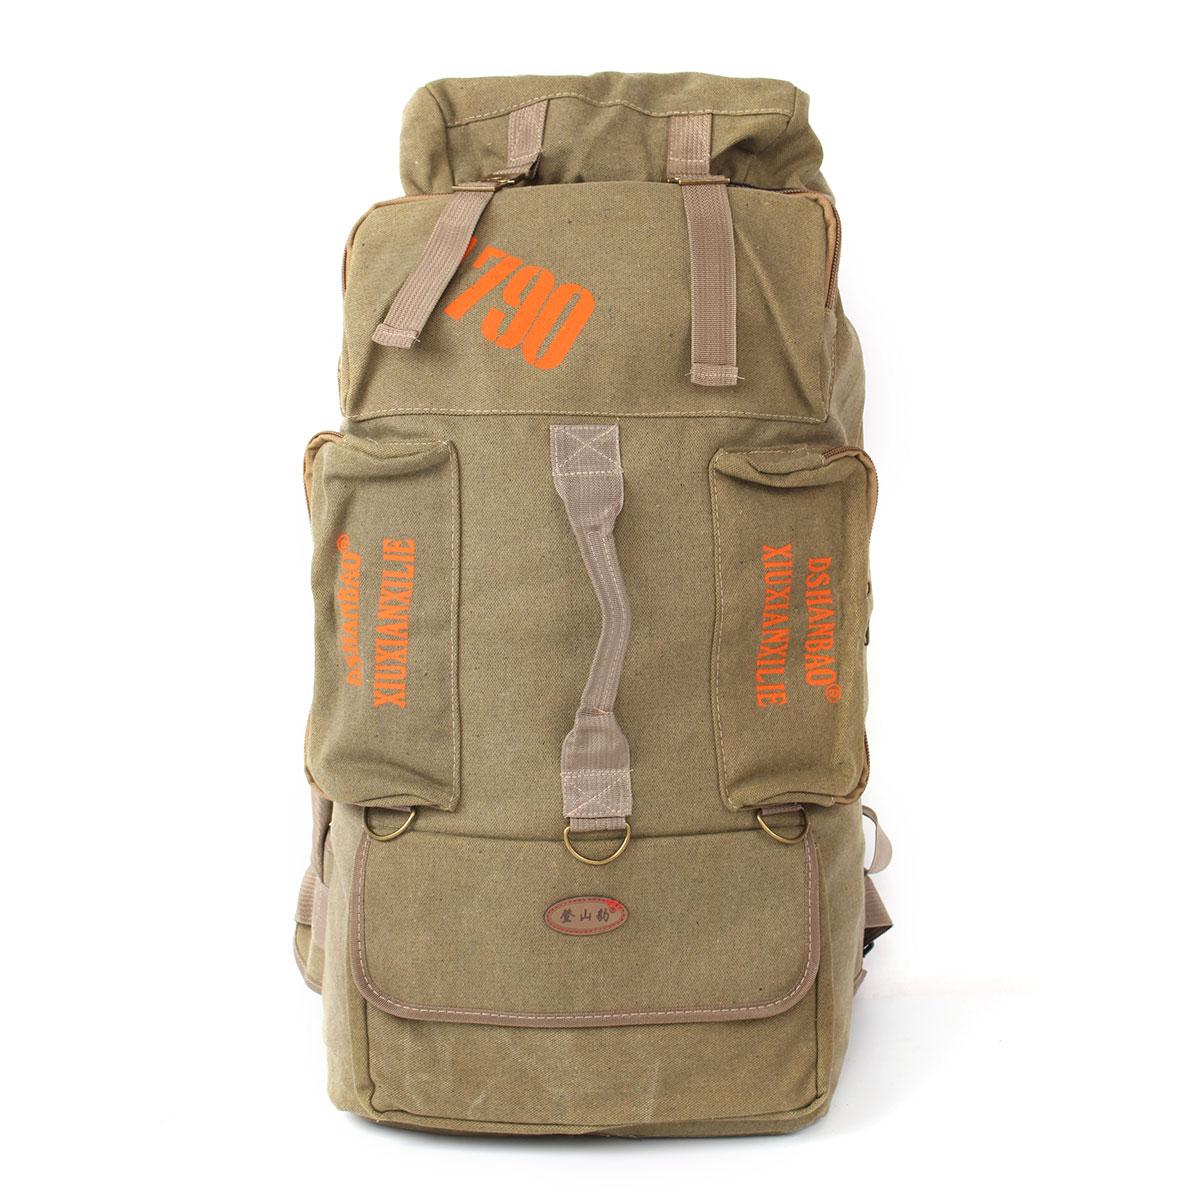 80L Camping Hiking Canvas Backpack Mountaineering Travel Rucksack Trekking Bag